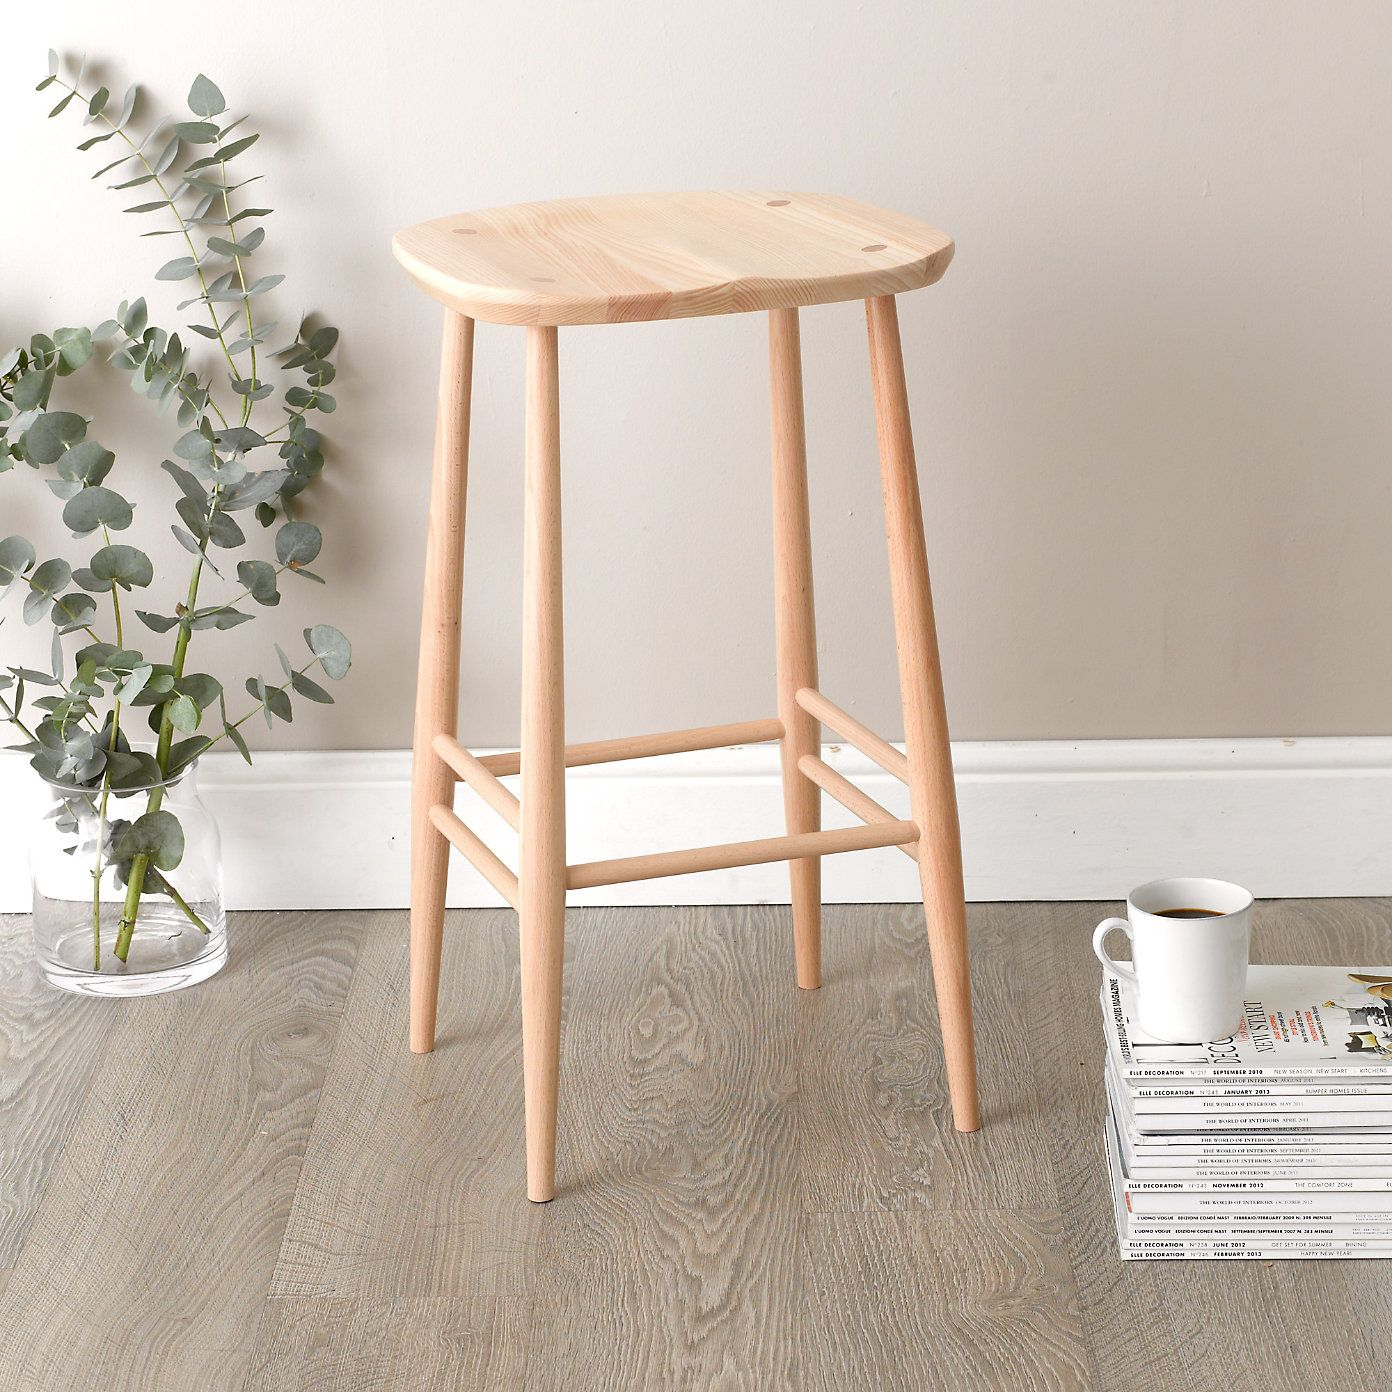 Ercol Bar Stool - Natural | The White Company | Ercol furniture ...